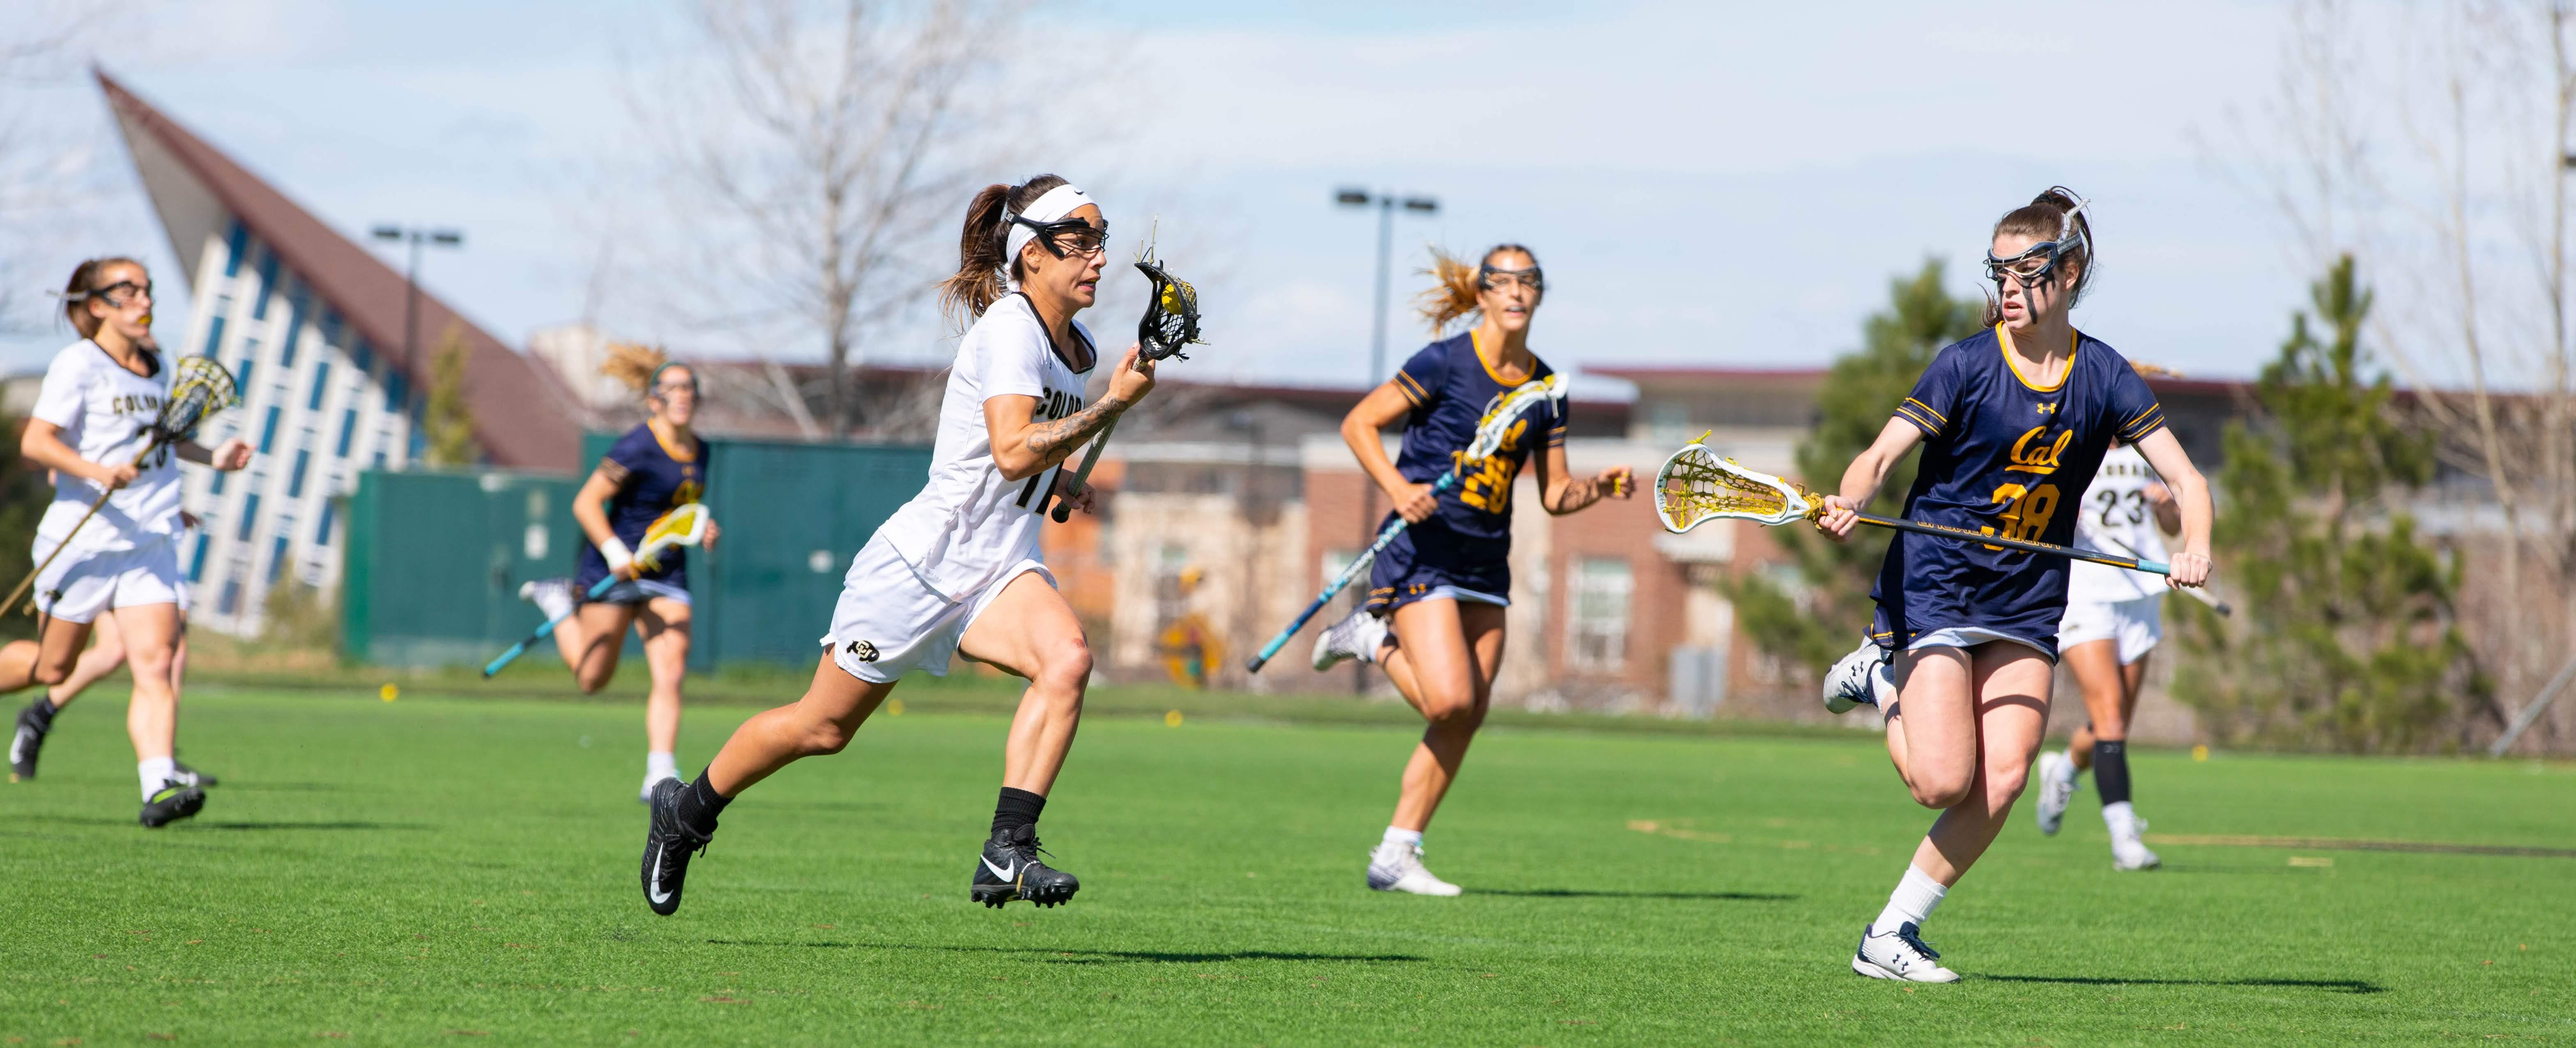 Women's lacrosse dominates UC Berkeley in senior night victory, 15-6